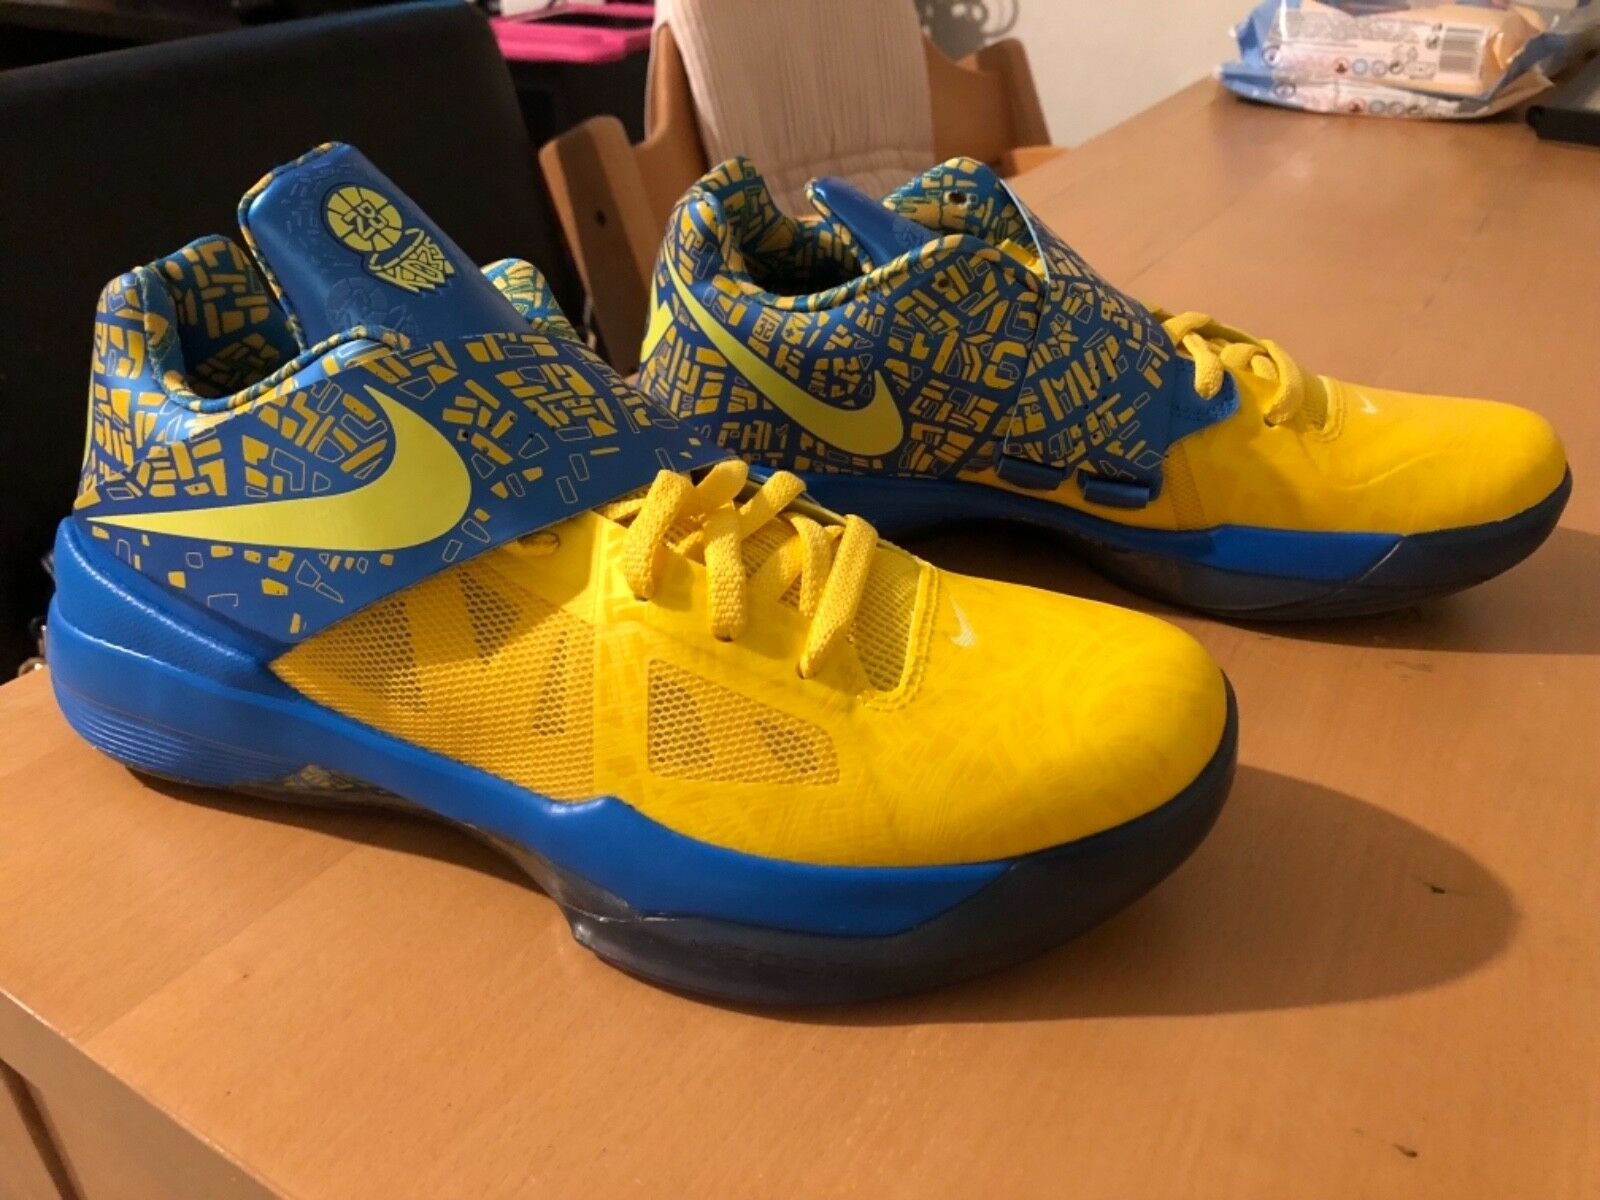 Nike KD IV 4 kevin durant Scoring Title size uk 8, us 9, eur 42.5